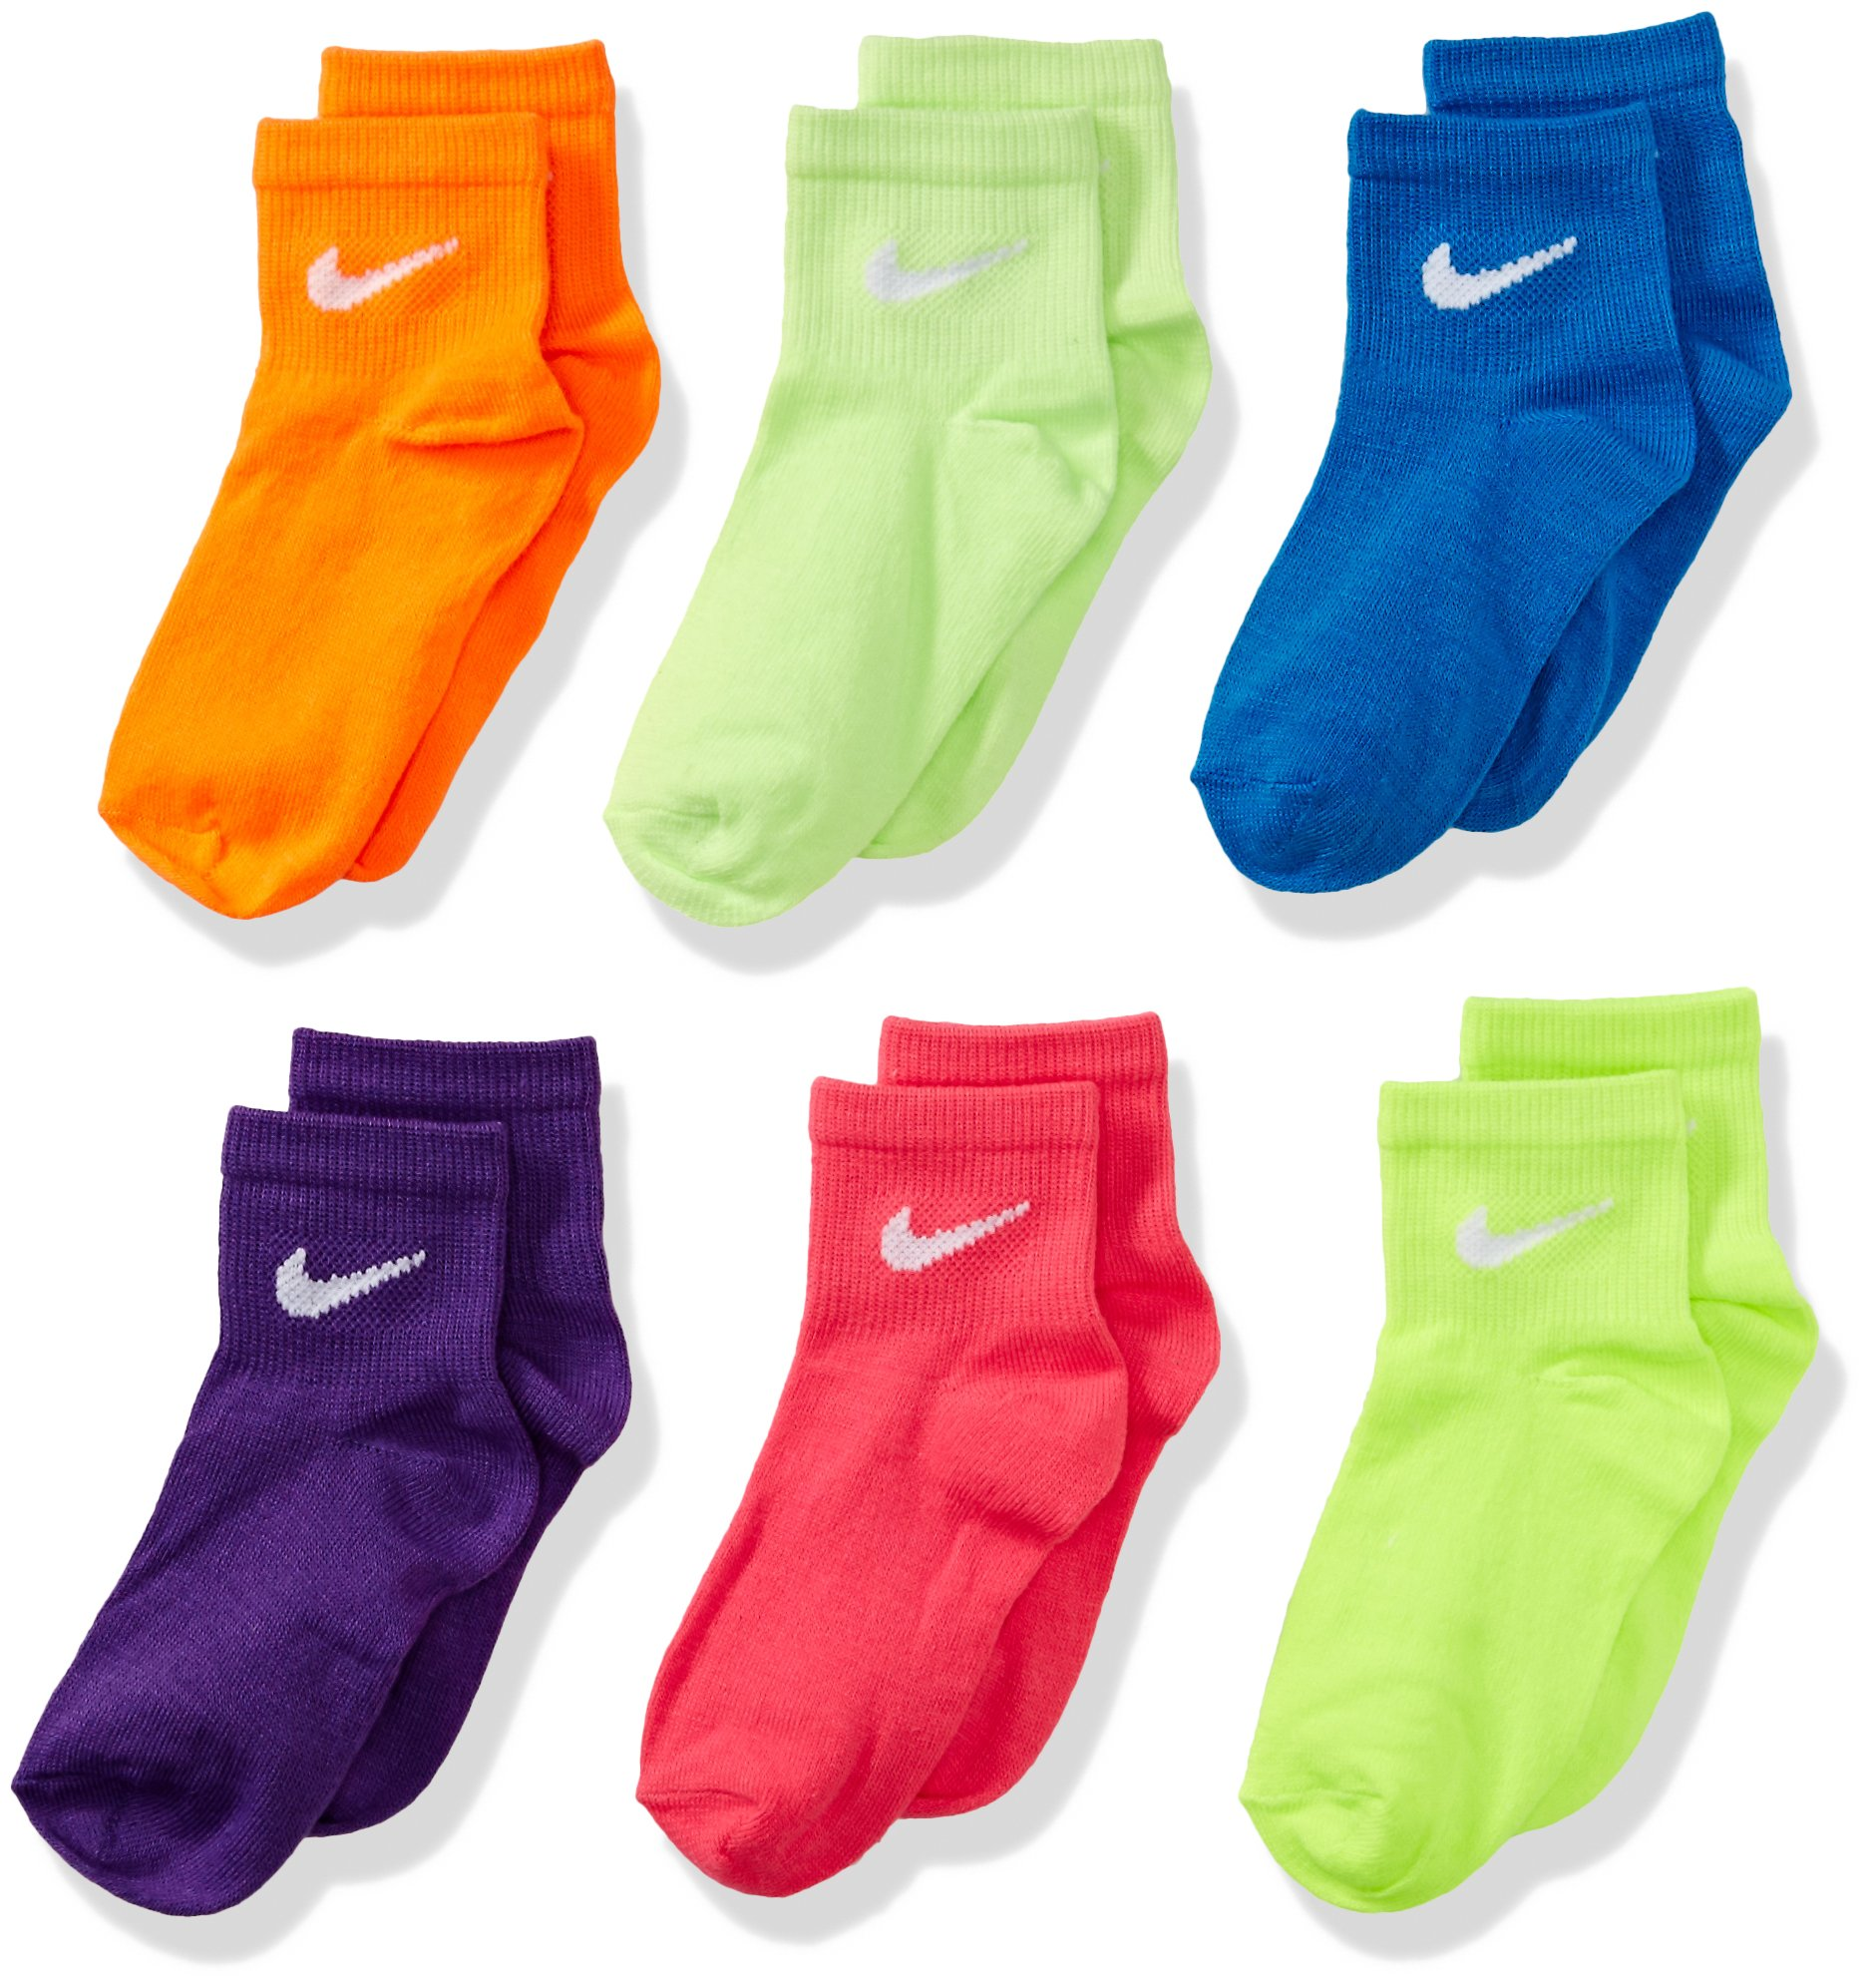 Nike PINK WHITE Color Toddler Girls Socks Size 6-7 US Shoe Size 13C- 3Y bTpsn